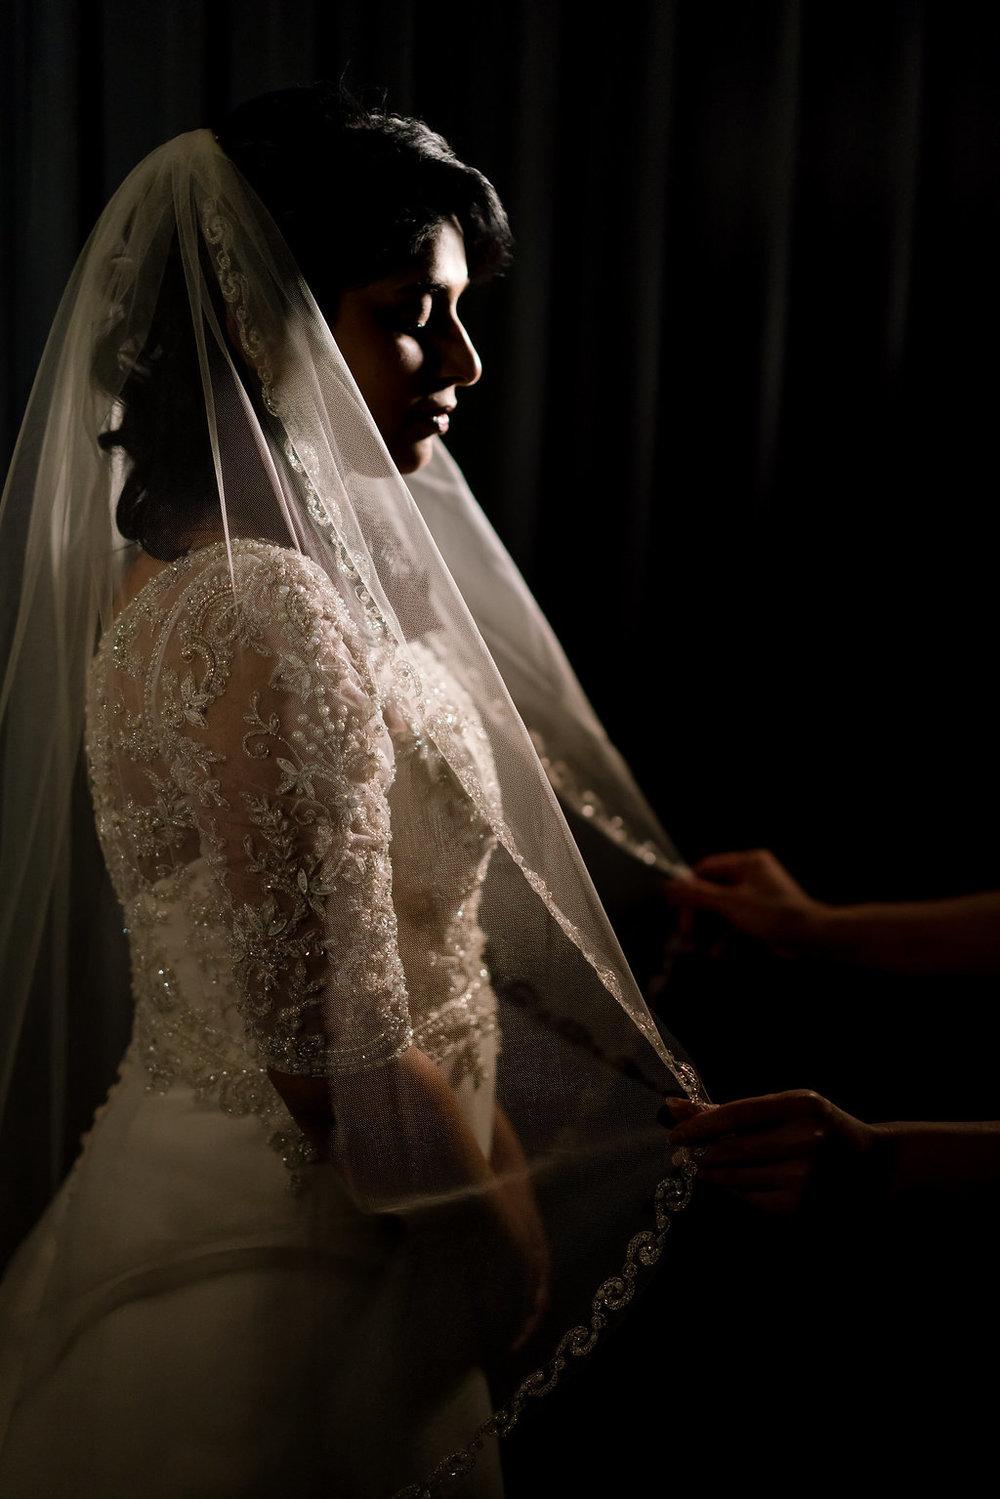 INDIAN WEDDING BRIDE SOLO SHOT.jpg